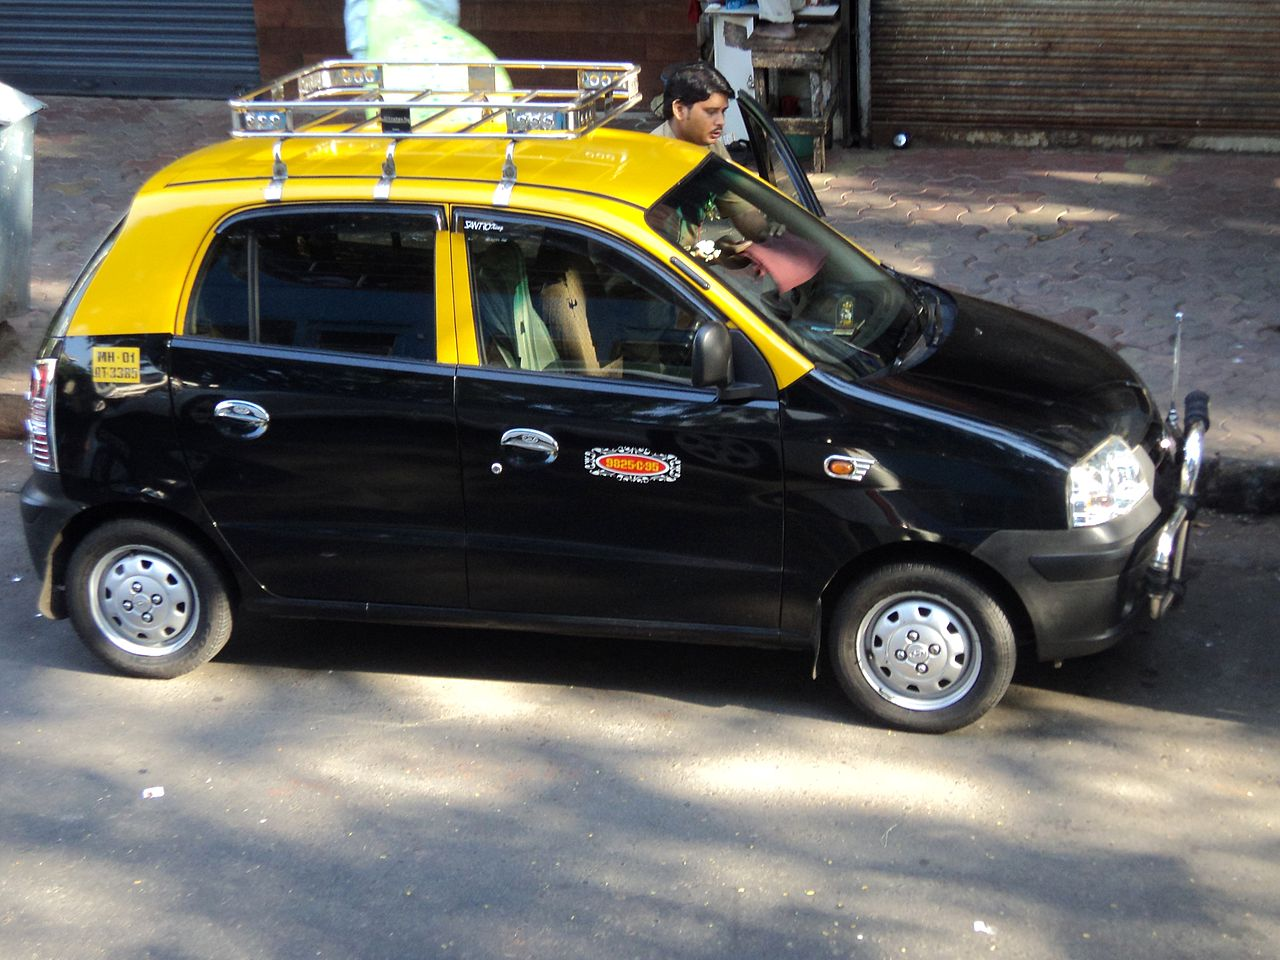 New Hyundai Sonata >> File:Taxi,mumbai,TN544.JPG - Wikimedia Commons